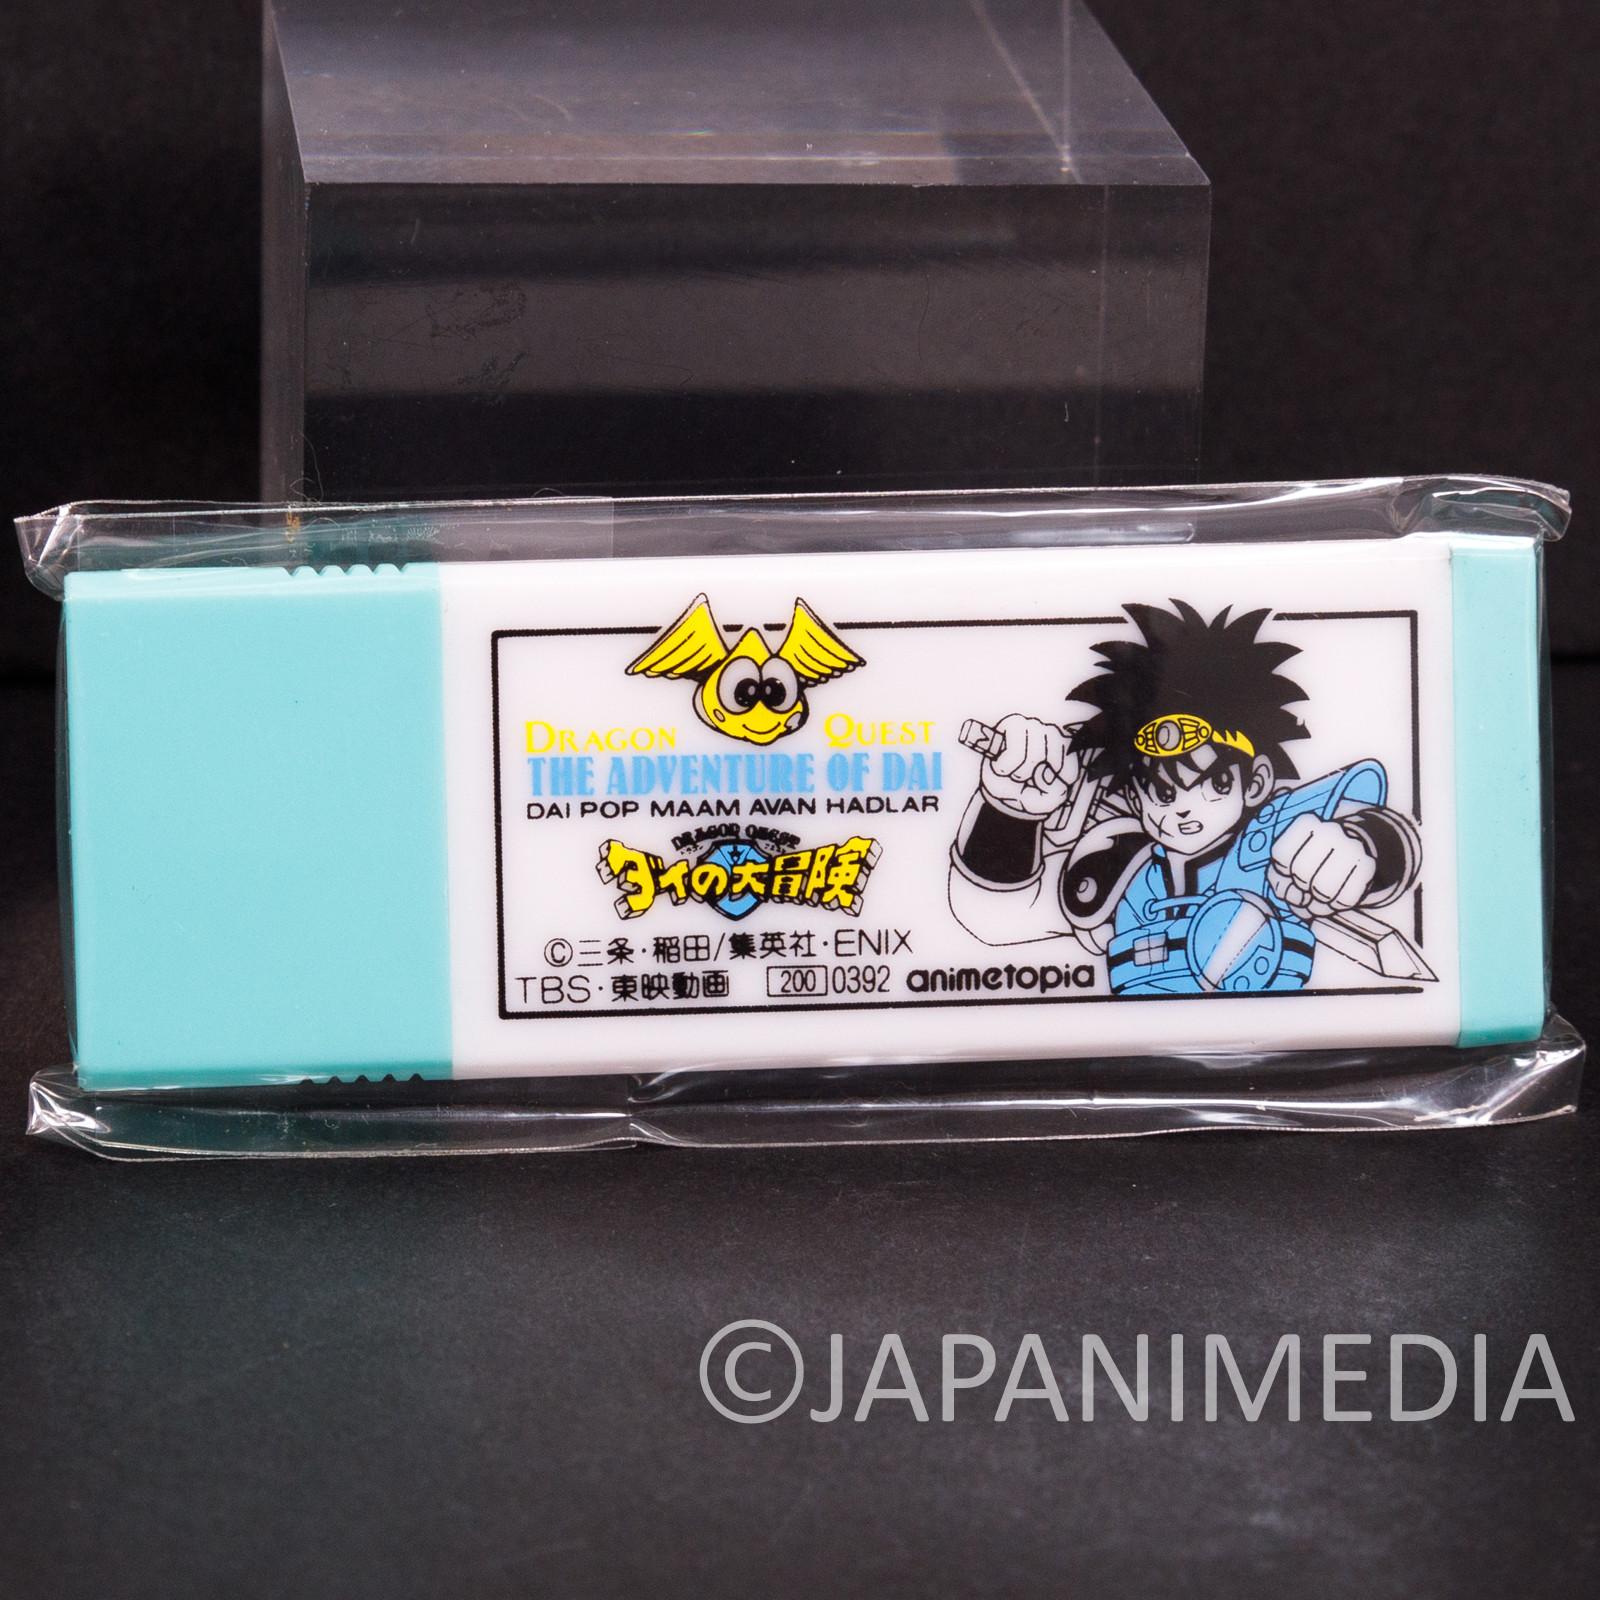 Dragon Quest: The Adventure of Dai Mechanical Pencil Lead JAPAN ANIME MANGA